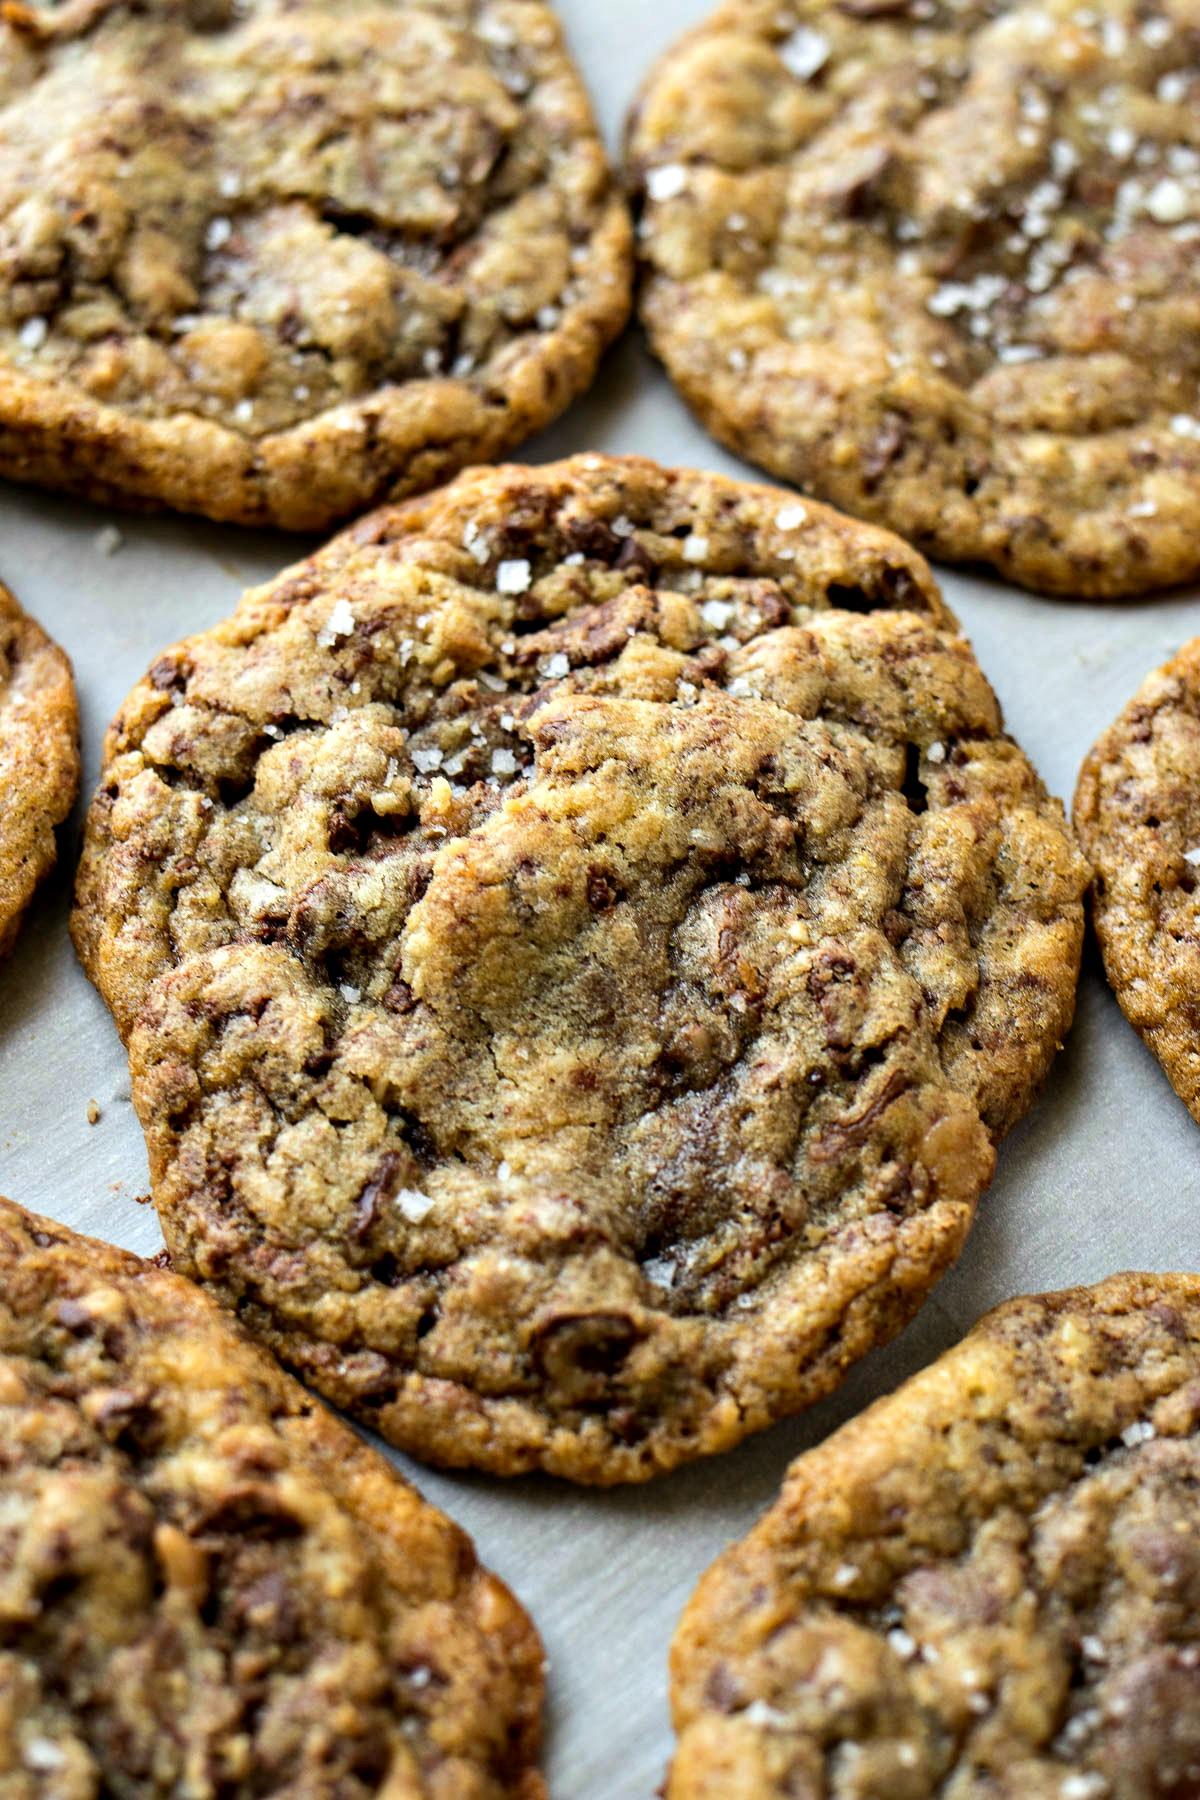 Sea Salt Toffee Chocolate Chip Cookie